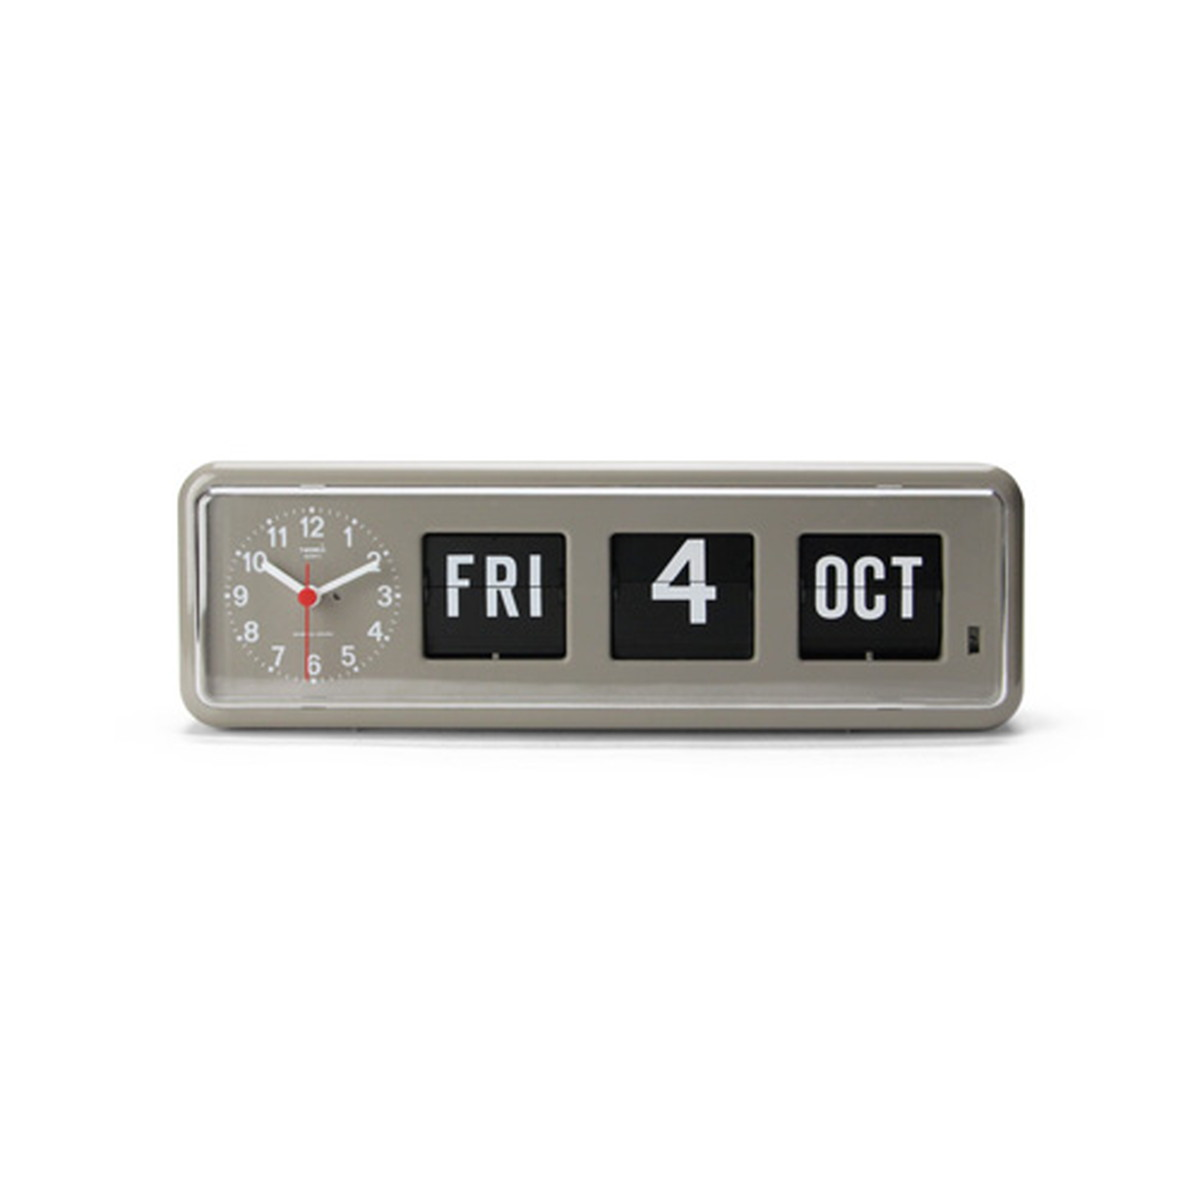 DETAIL INC. - TWEMCO CALENDAR CLOCK BQ-38 GYカレンダー付き時計